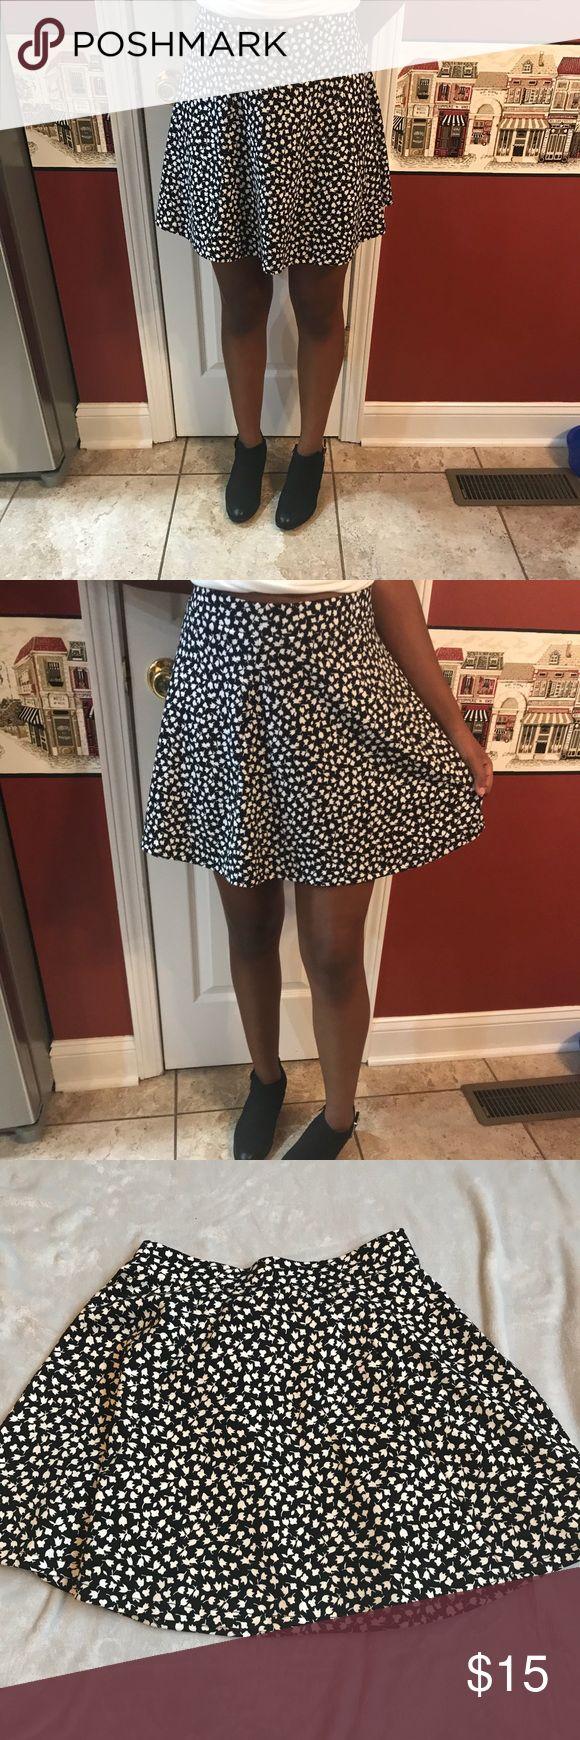 Aeropostale high waisted mini shirt Nwot pull on shirt. Black with white tulips 🌷. Very cute and fun. Aeropostale Skirts Mini